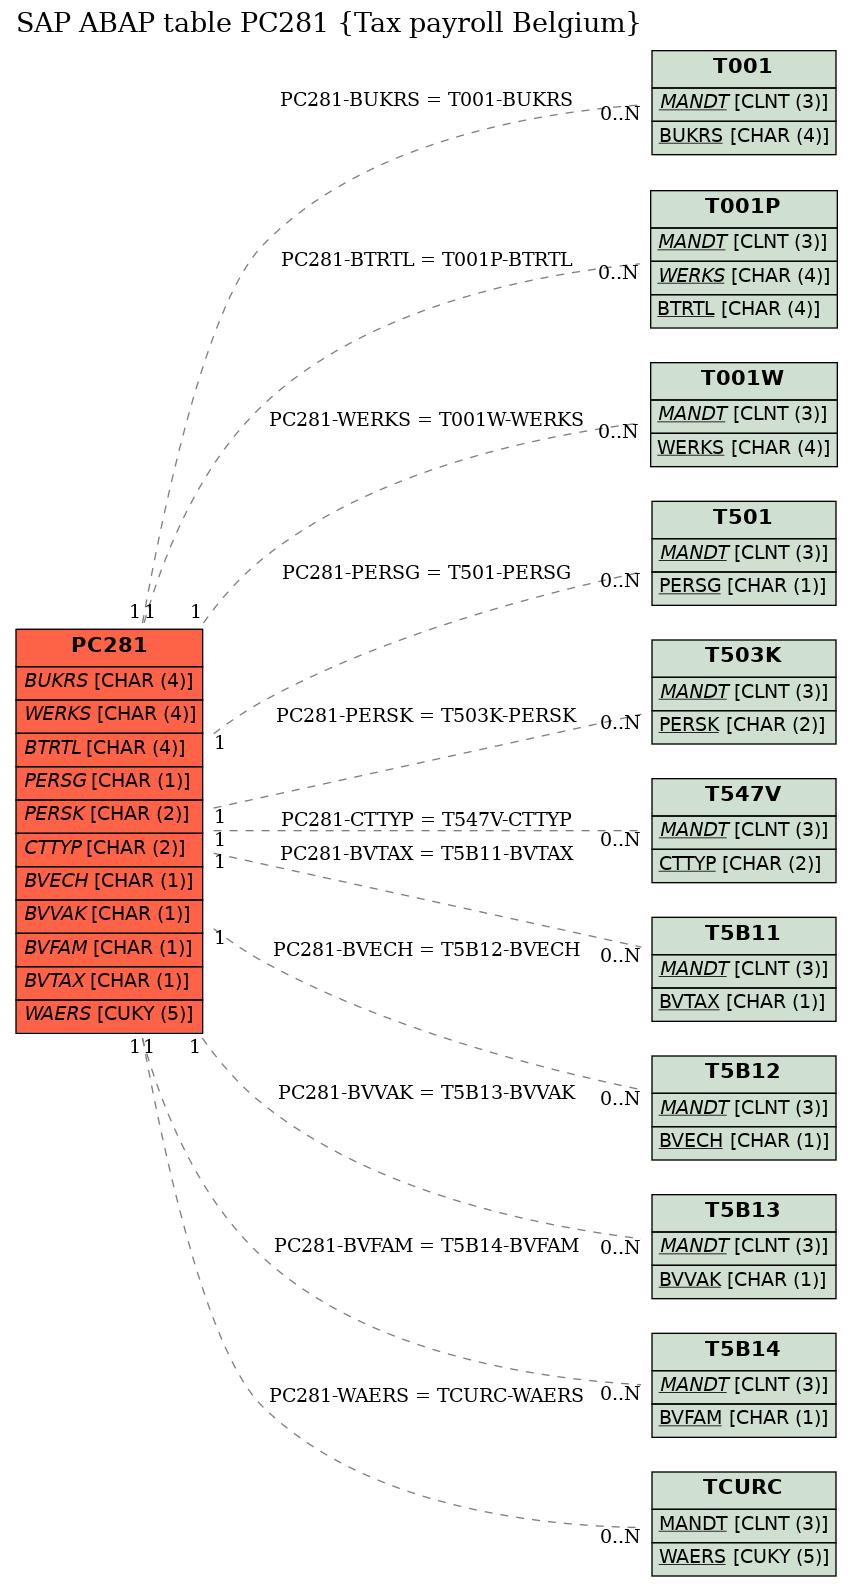 E-R Diagram for table PC281 (Tax payroll Belgium)